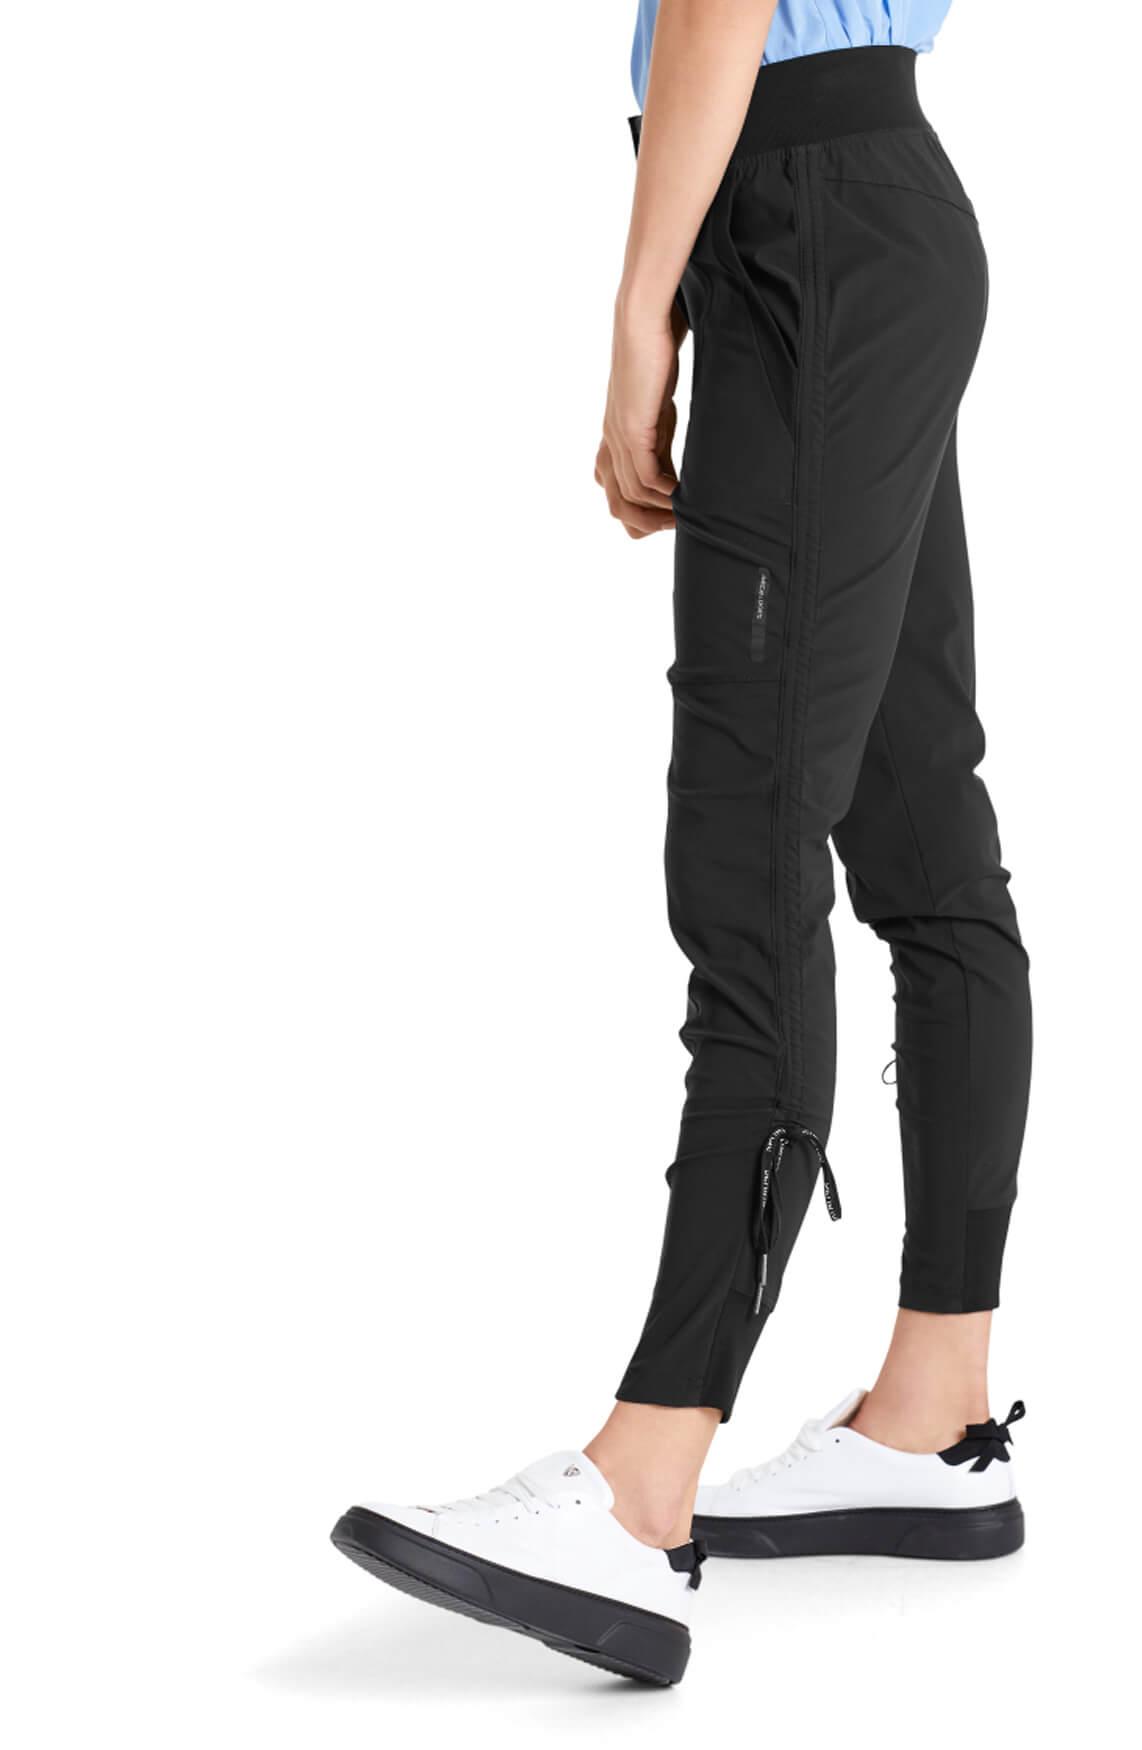 Marccain Sports Dames Broek met stretch zwart